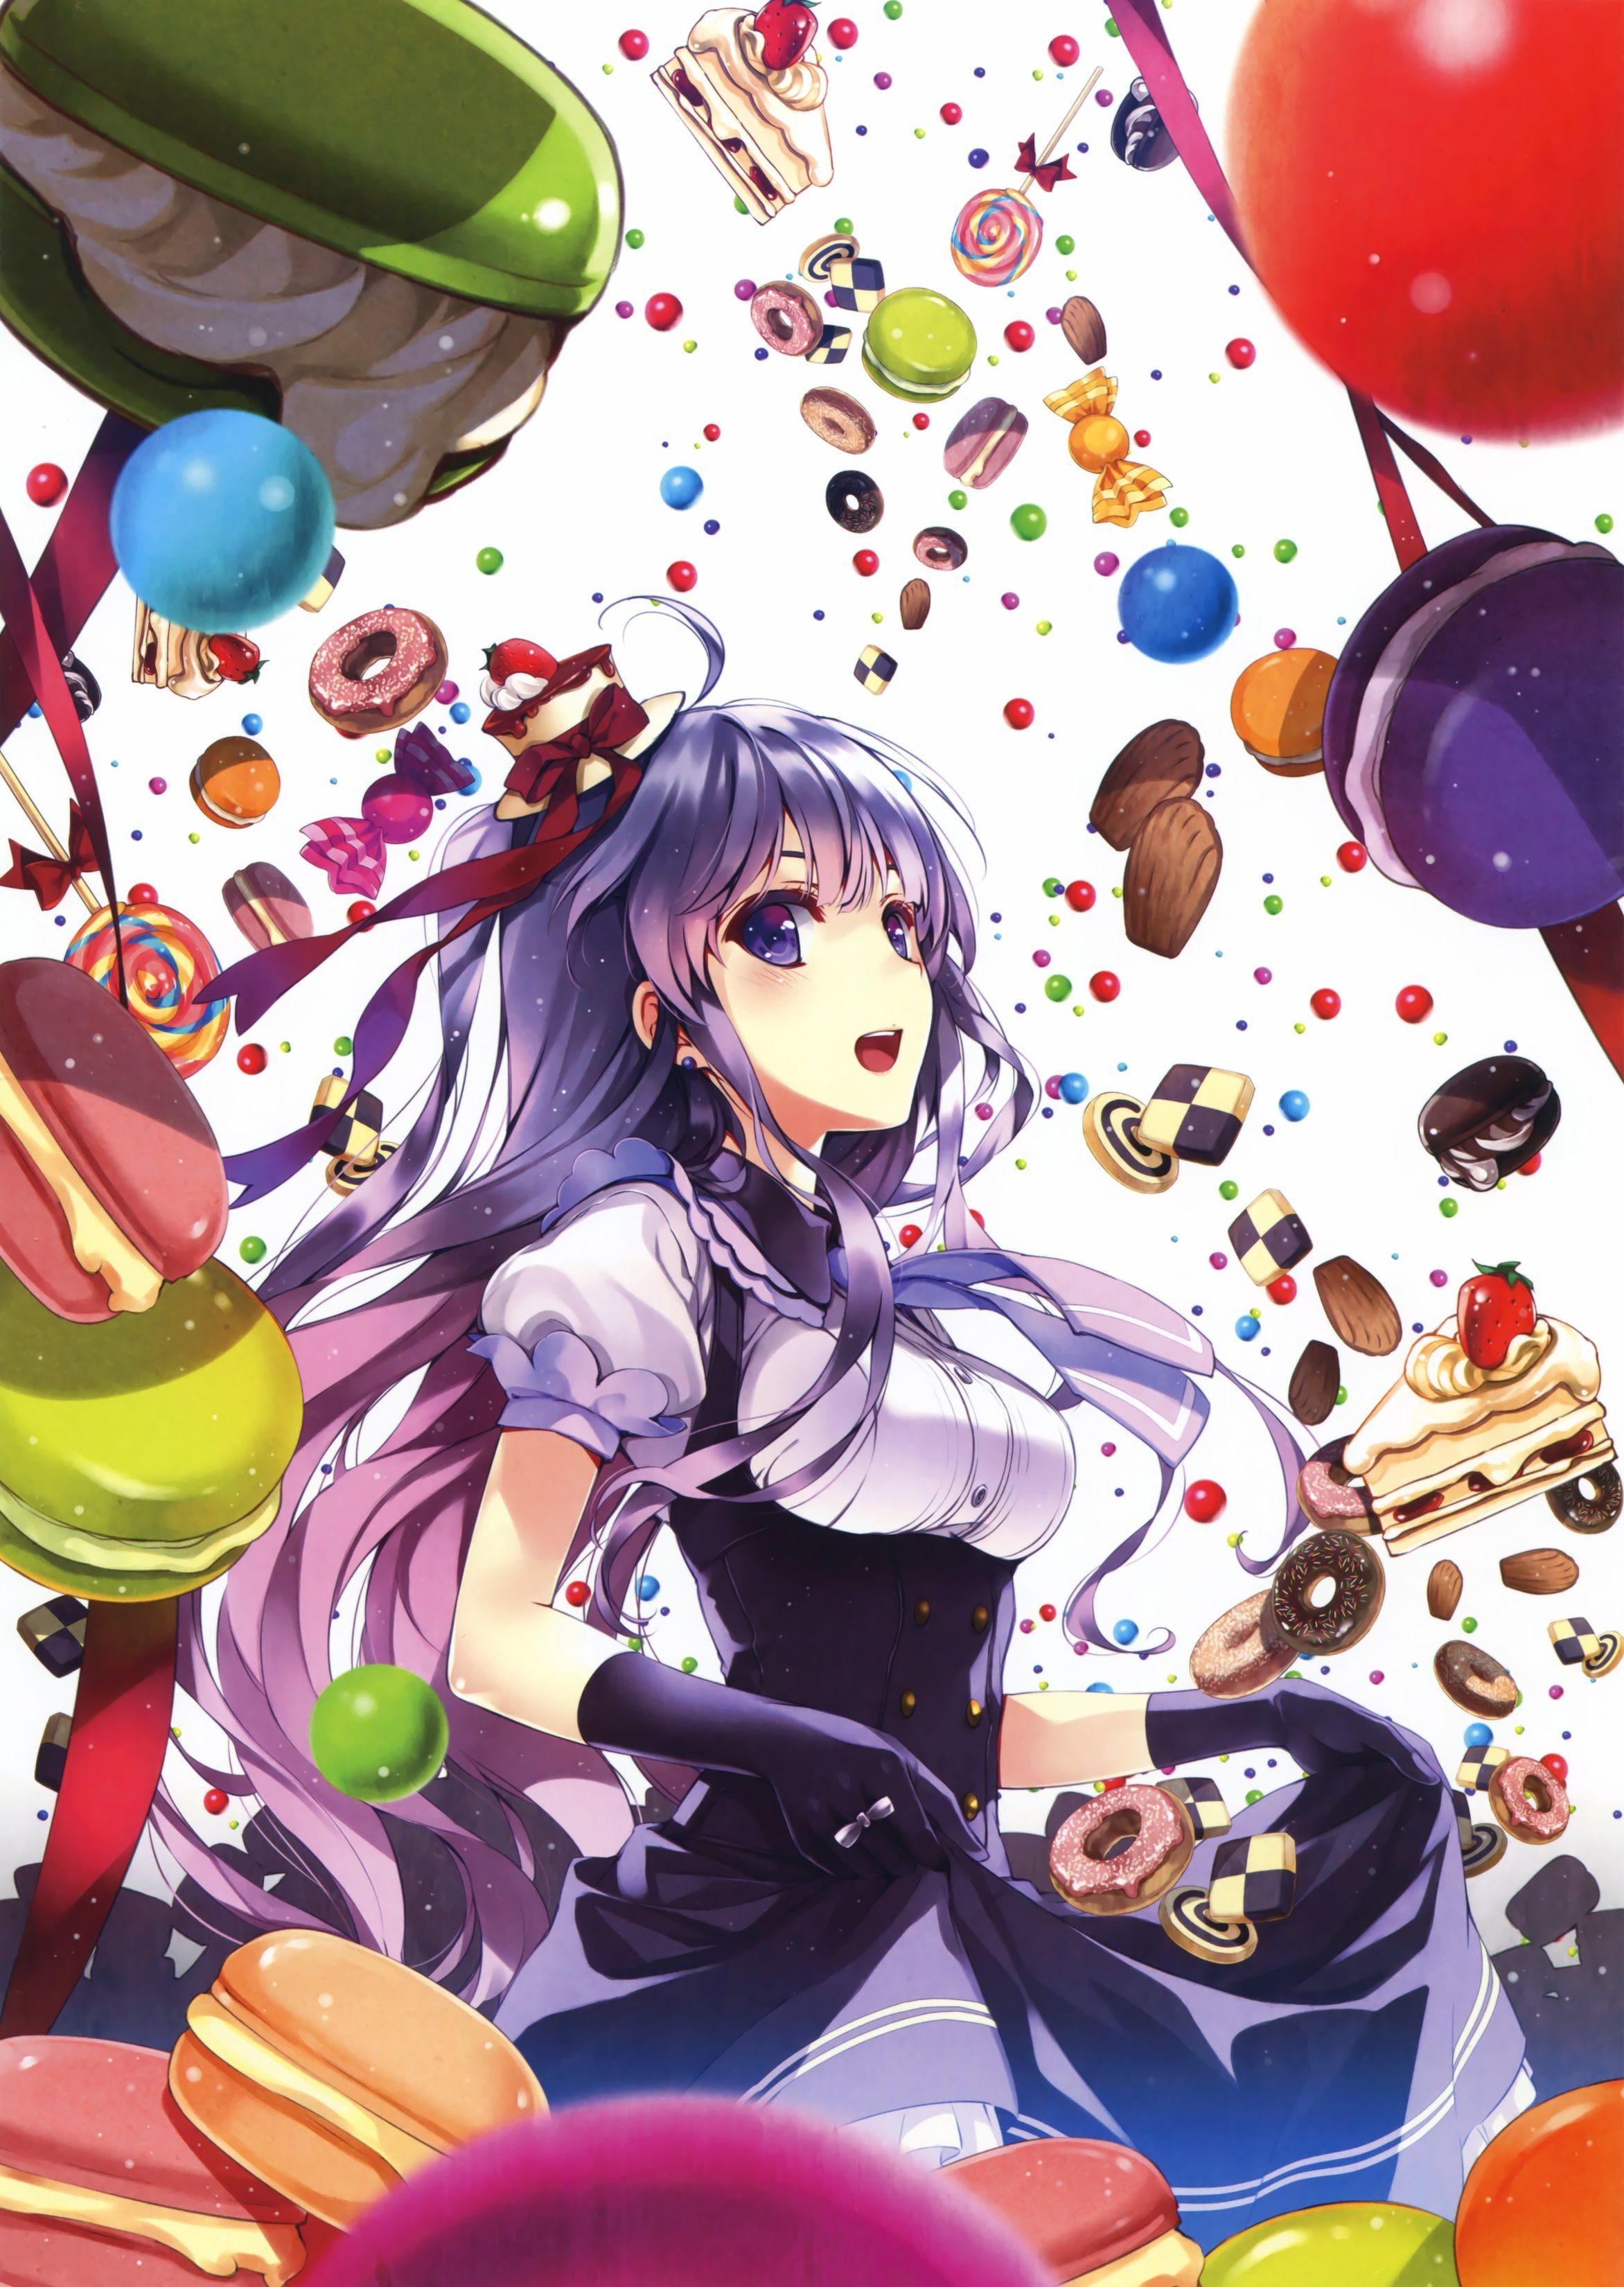 Pin de Christy Sebring en Anime!! σ.σ   Pinterest   Manga, Dibujos ...